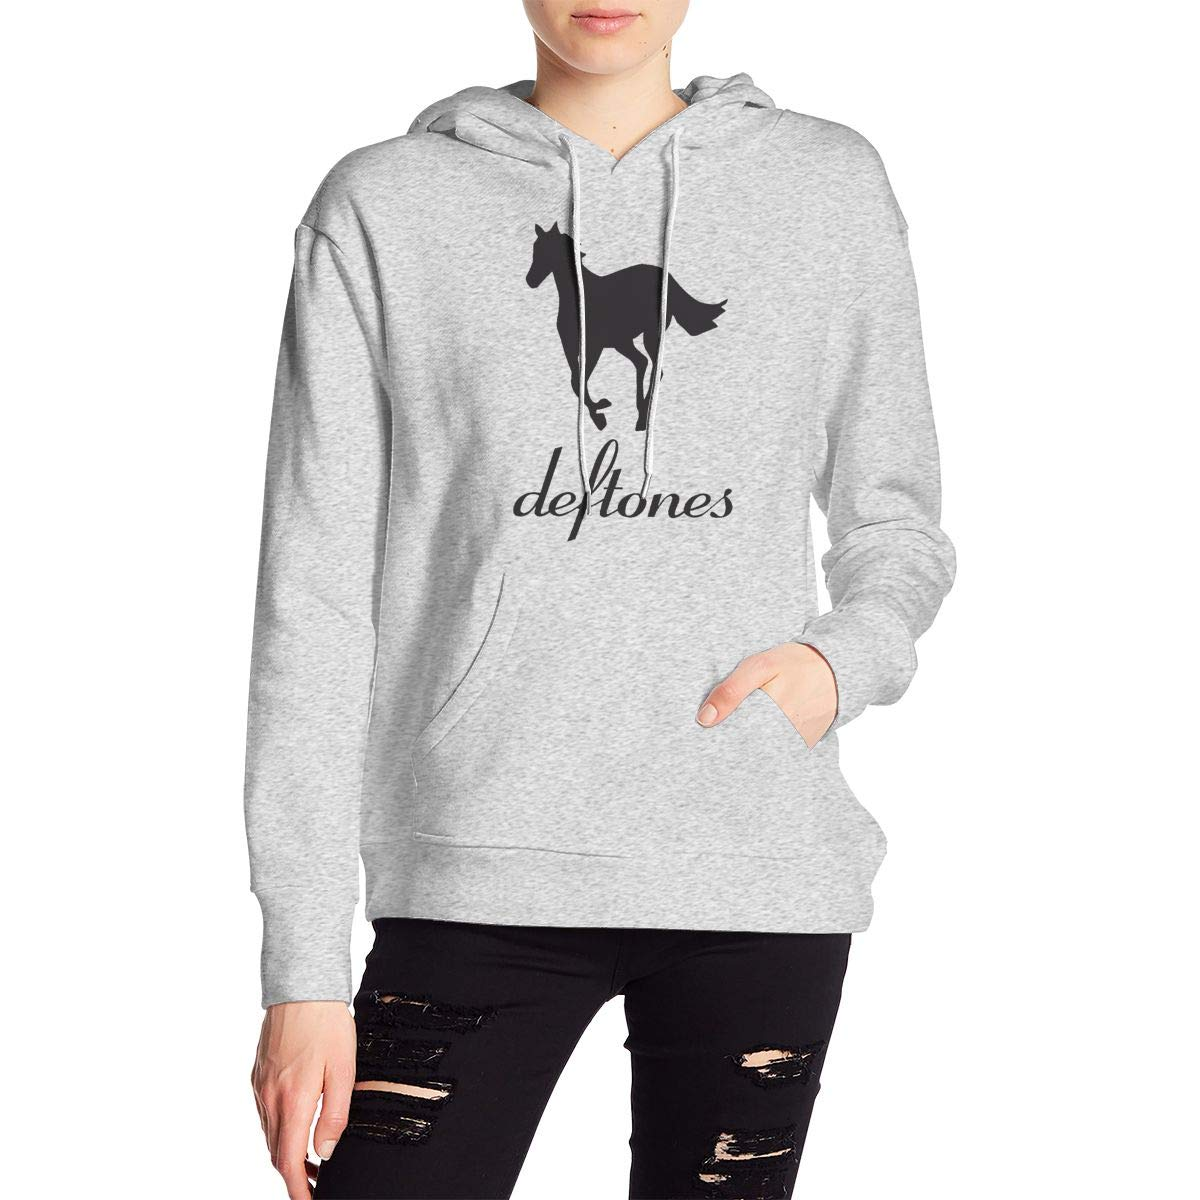 Womens Active Long Sleeve Fashion Hoodie Tunic Deftones Pullover Sweatshirt with Kangaroo Pocket